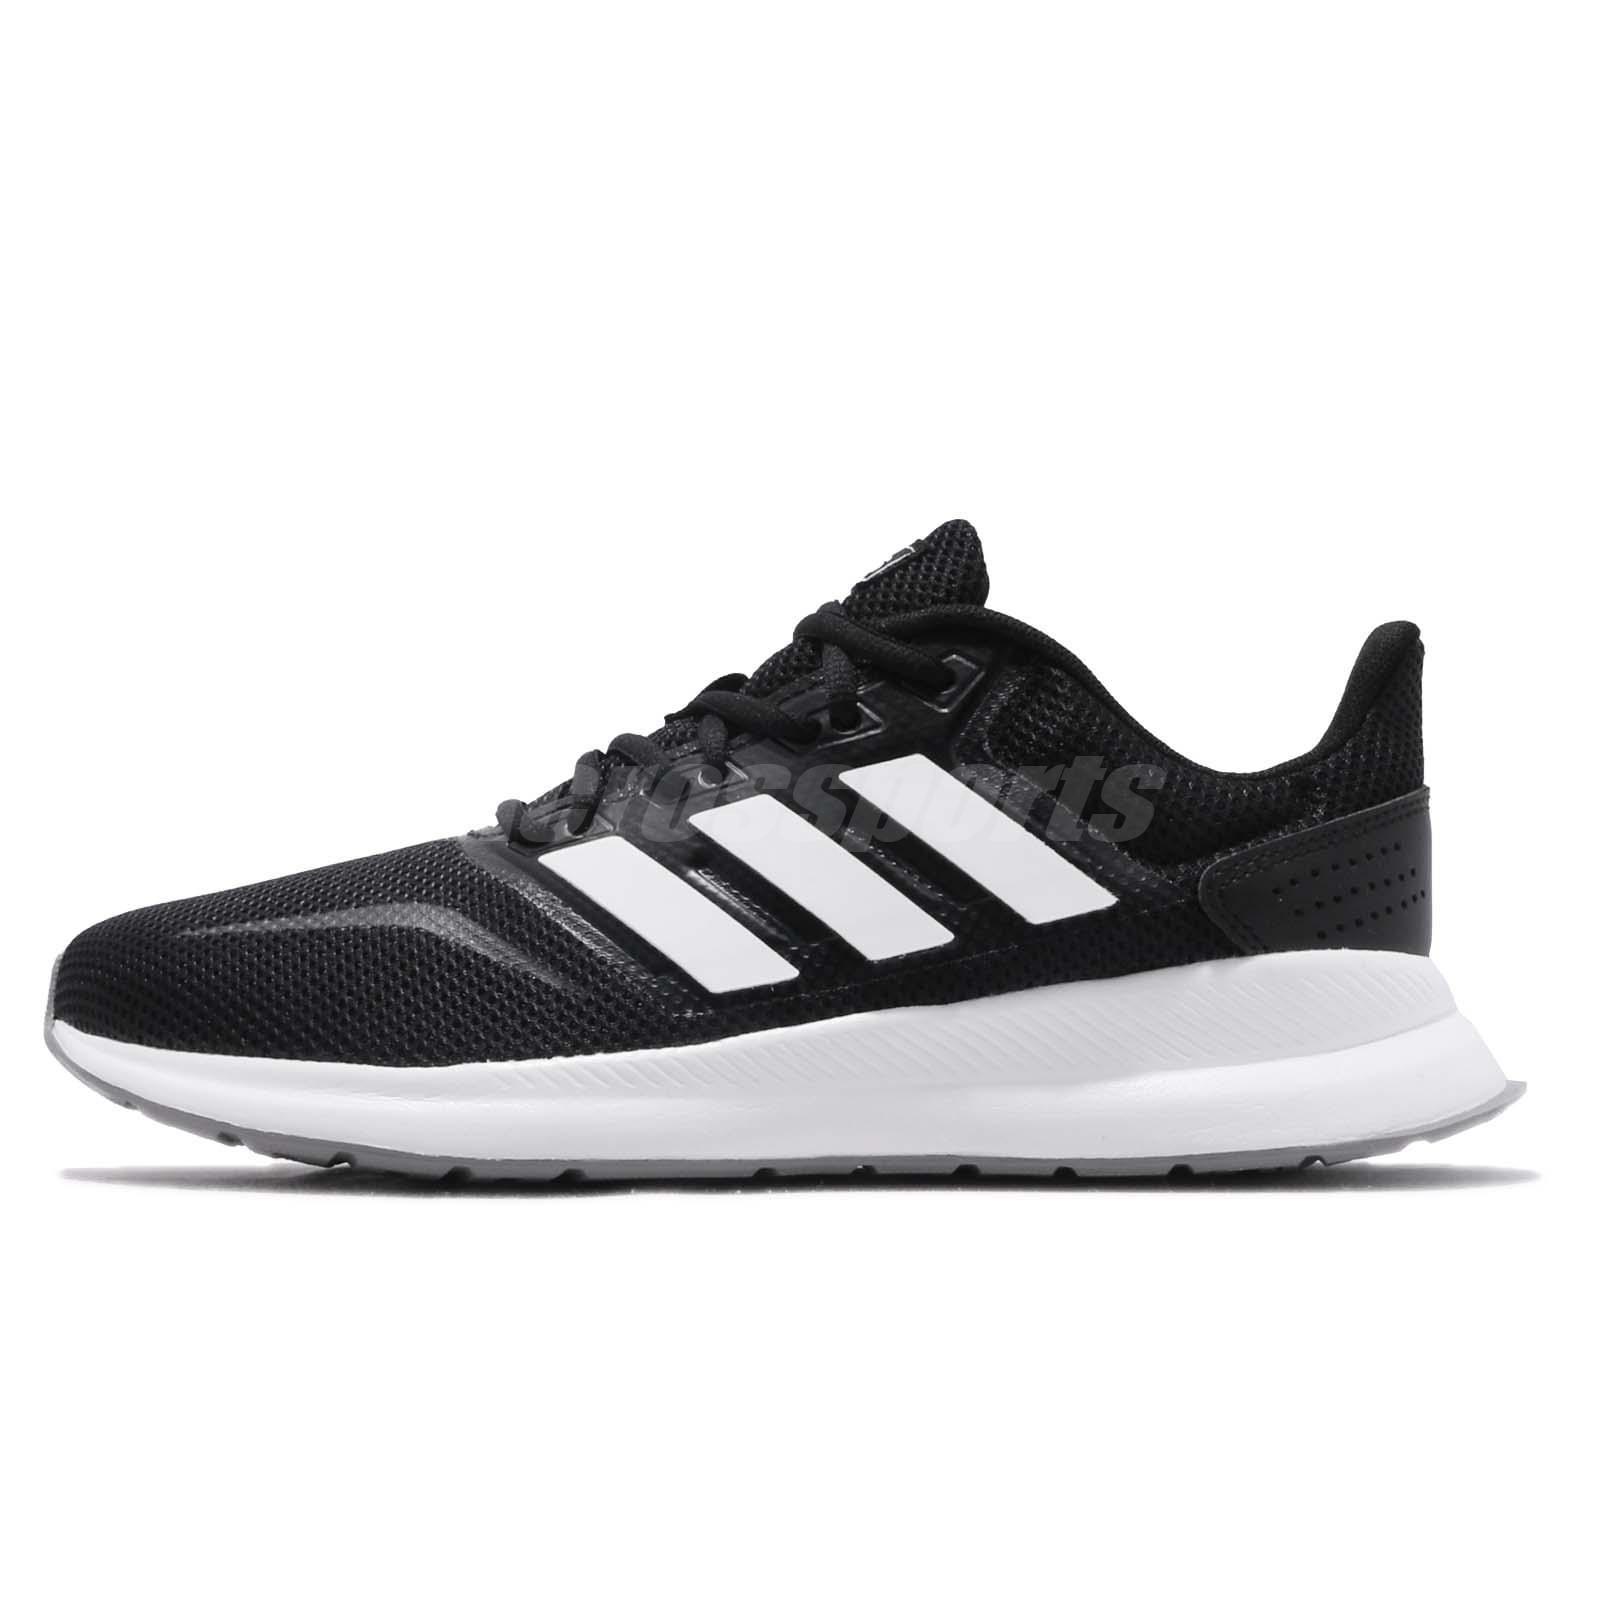 selva paso paridad  adidas Runfalcon Black White Grey Men Running Training Shoes Sneakers F36199    eBay